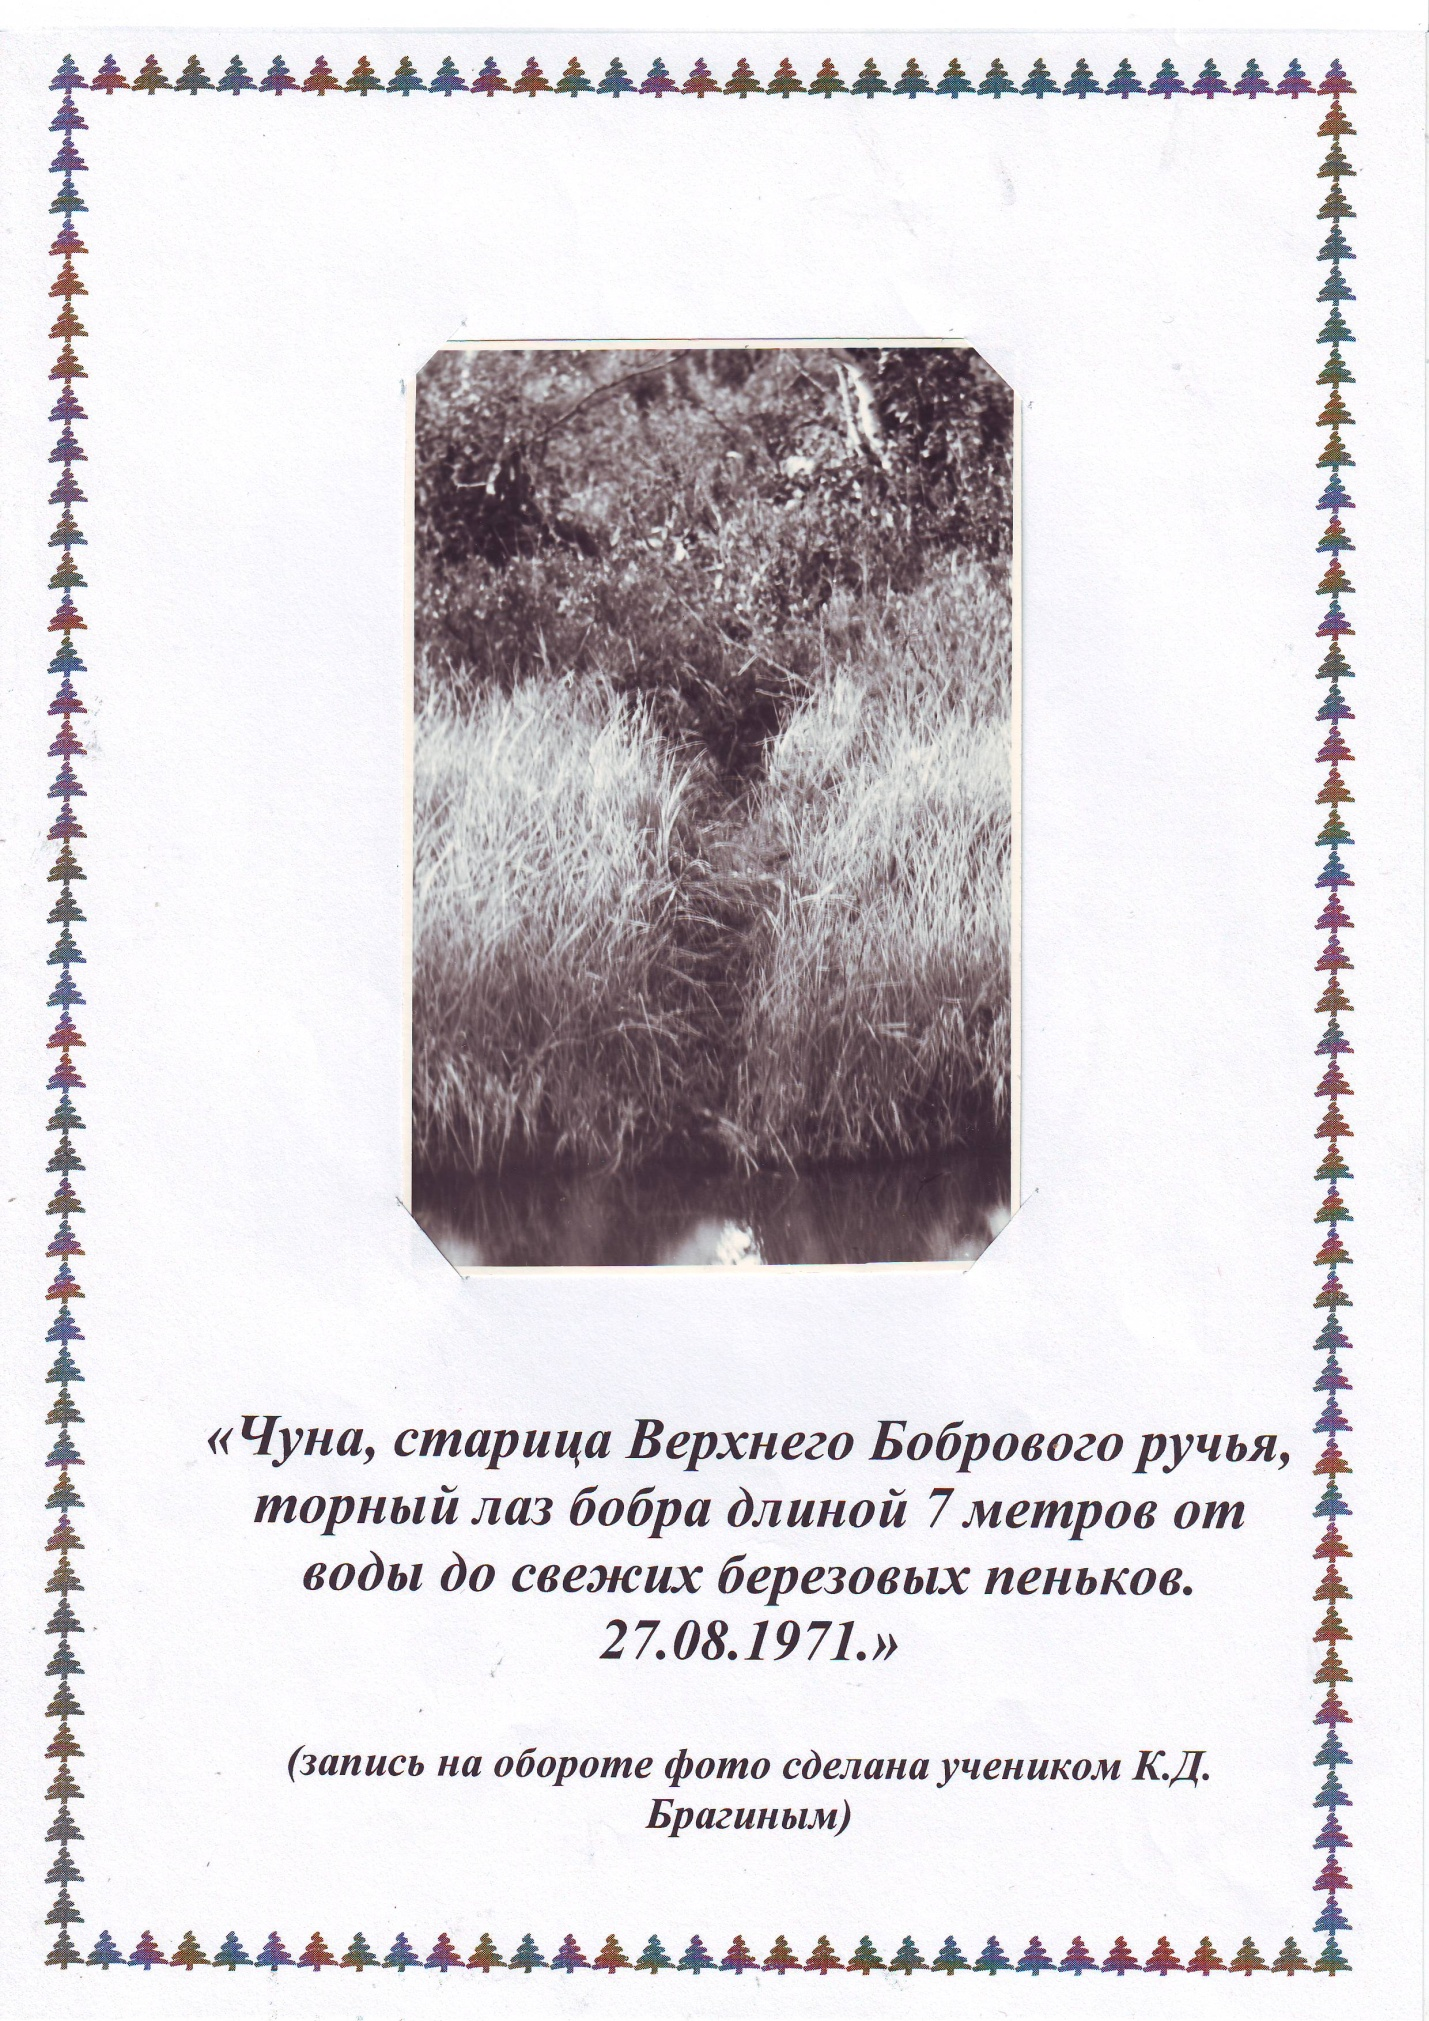 H:\Конкурсы\К.Д. Янковский\Янковский\Image0002.JPG